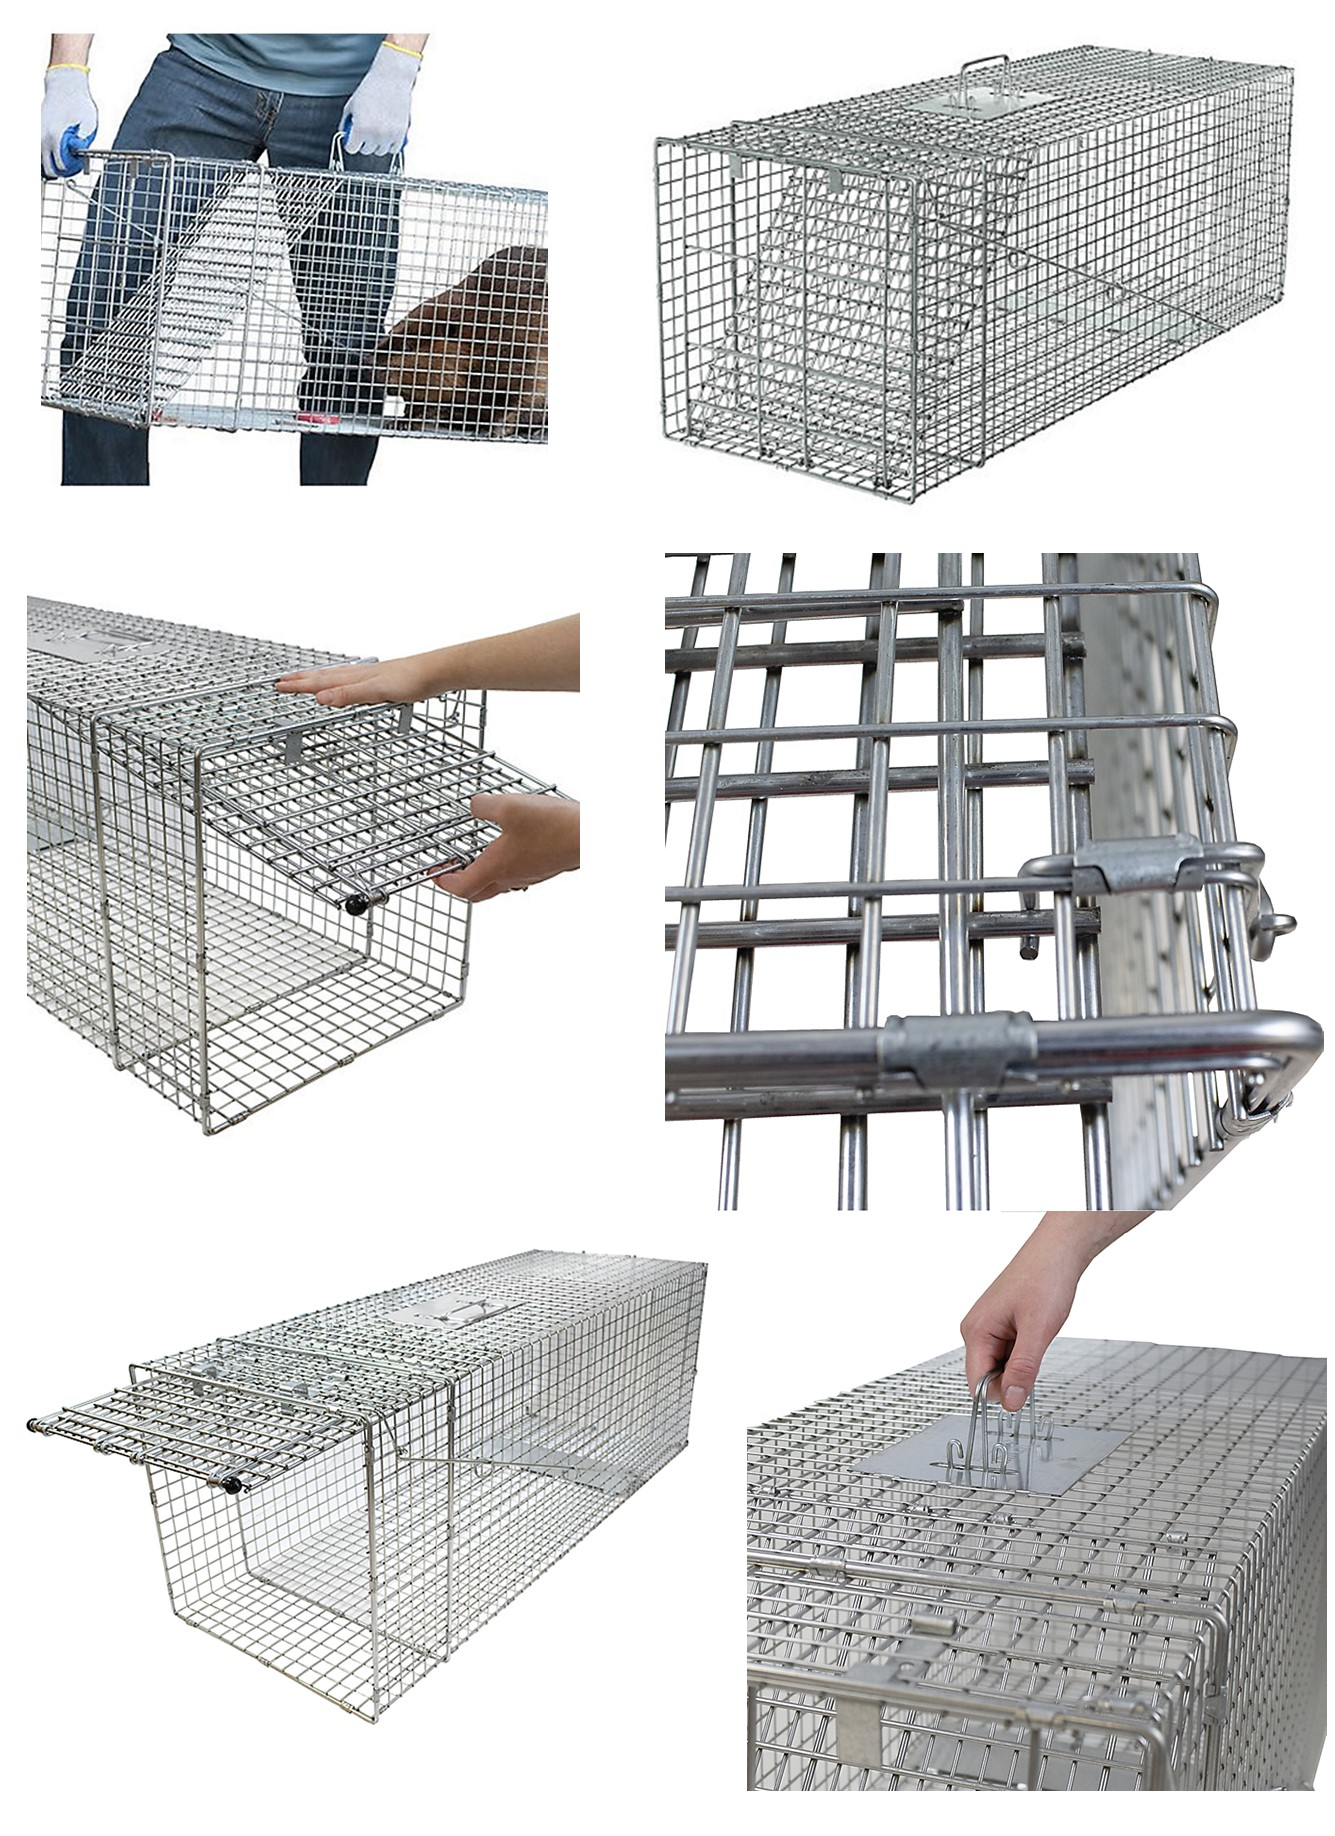 havahart-live-animal-cage-trap-model-1081-751081-131.00.jpg